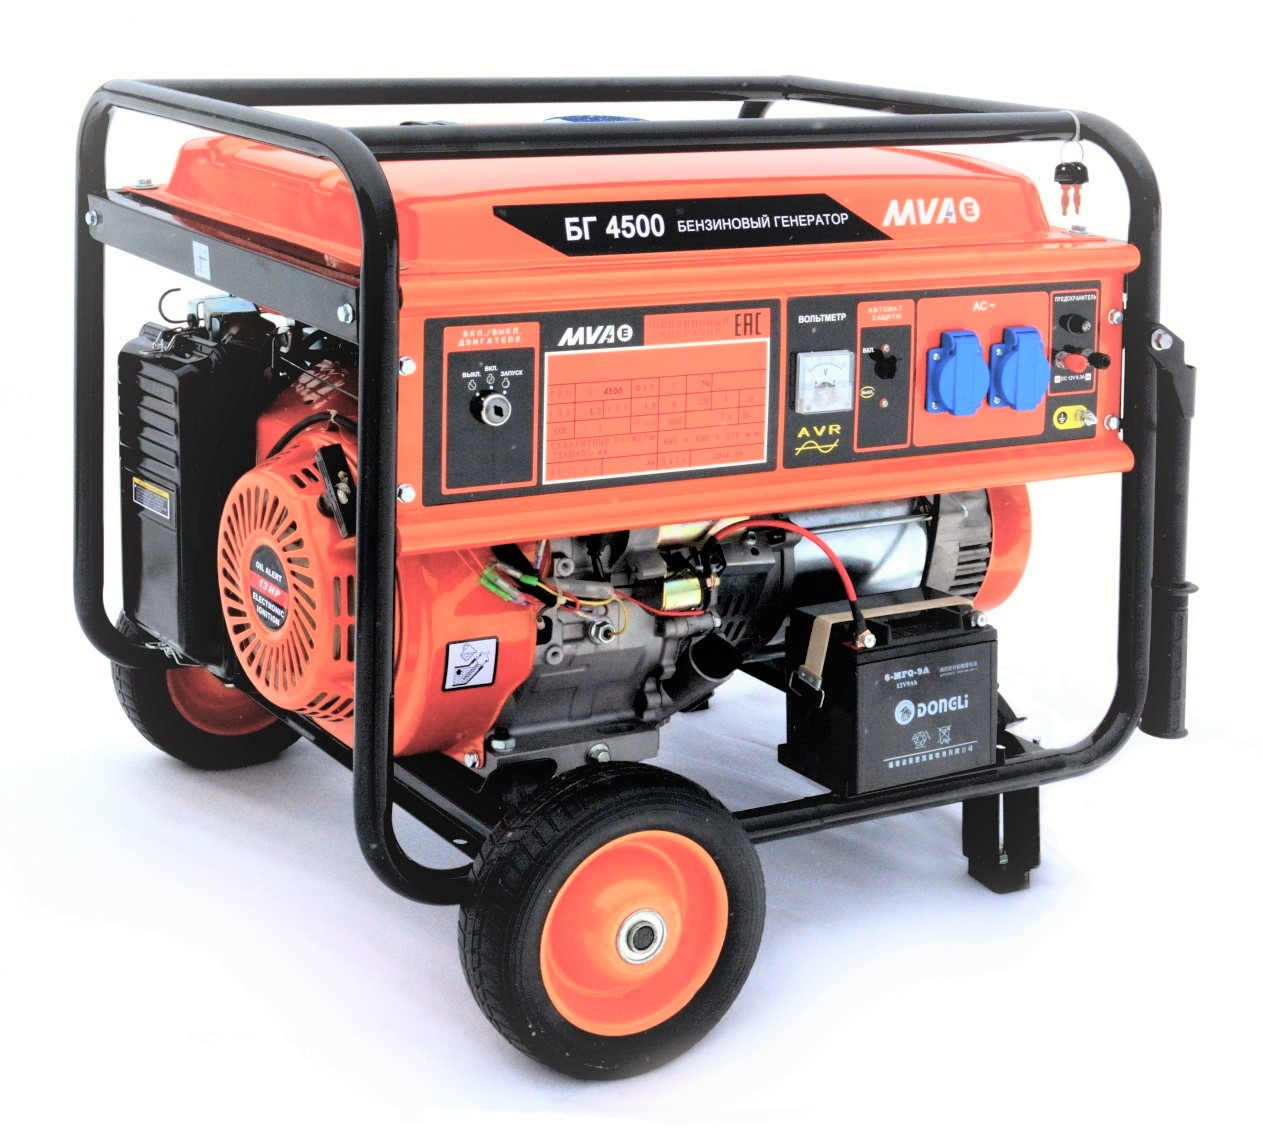 Бензиновый генератор Mvae БГ 4500